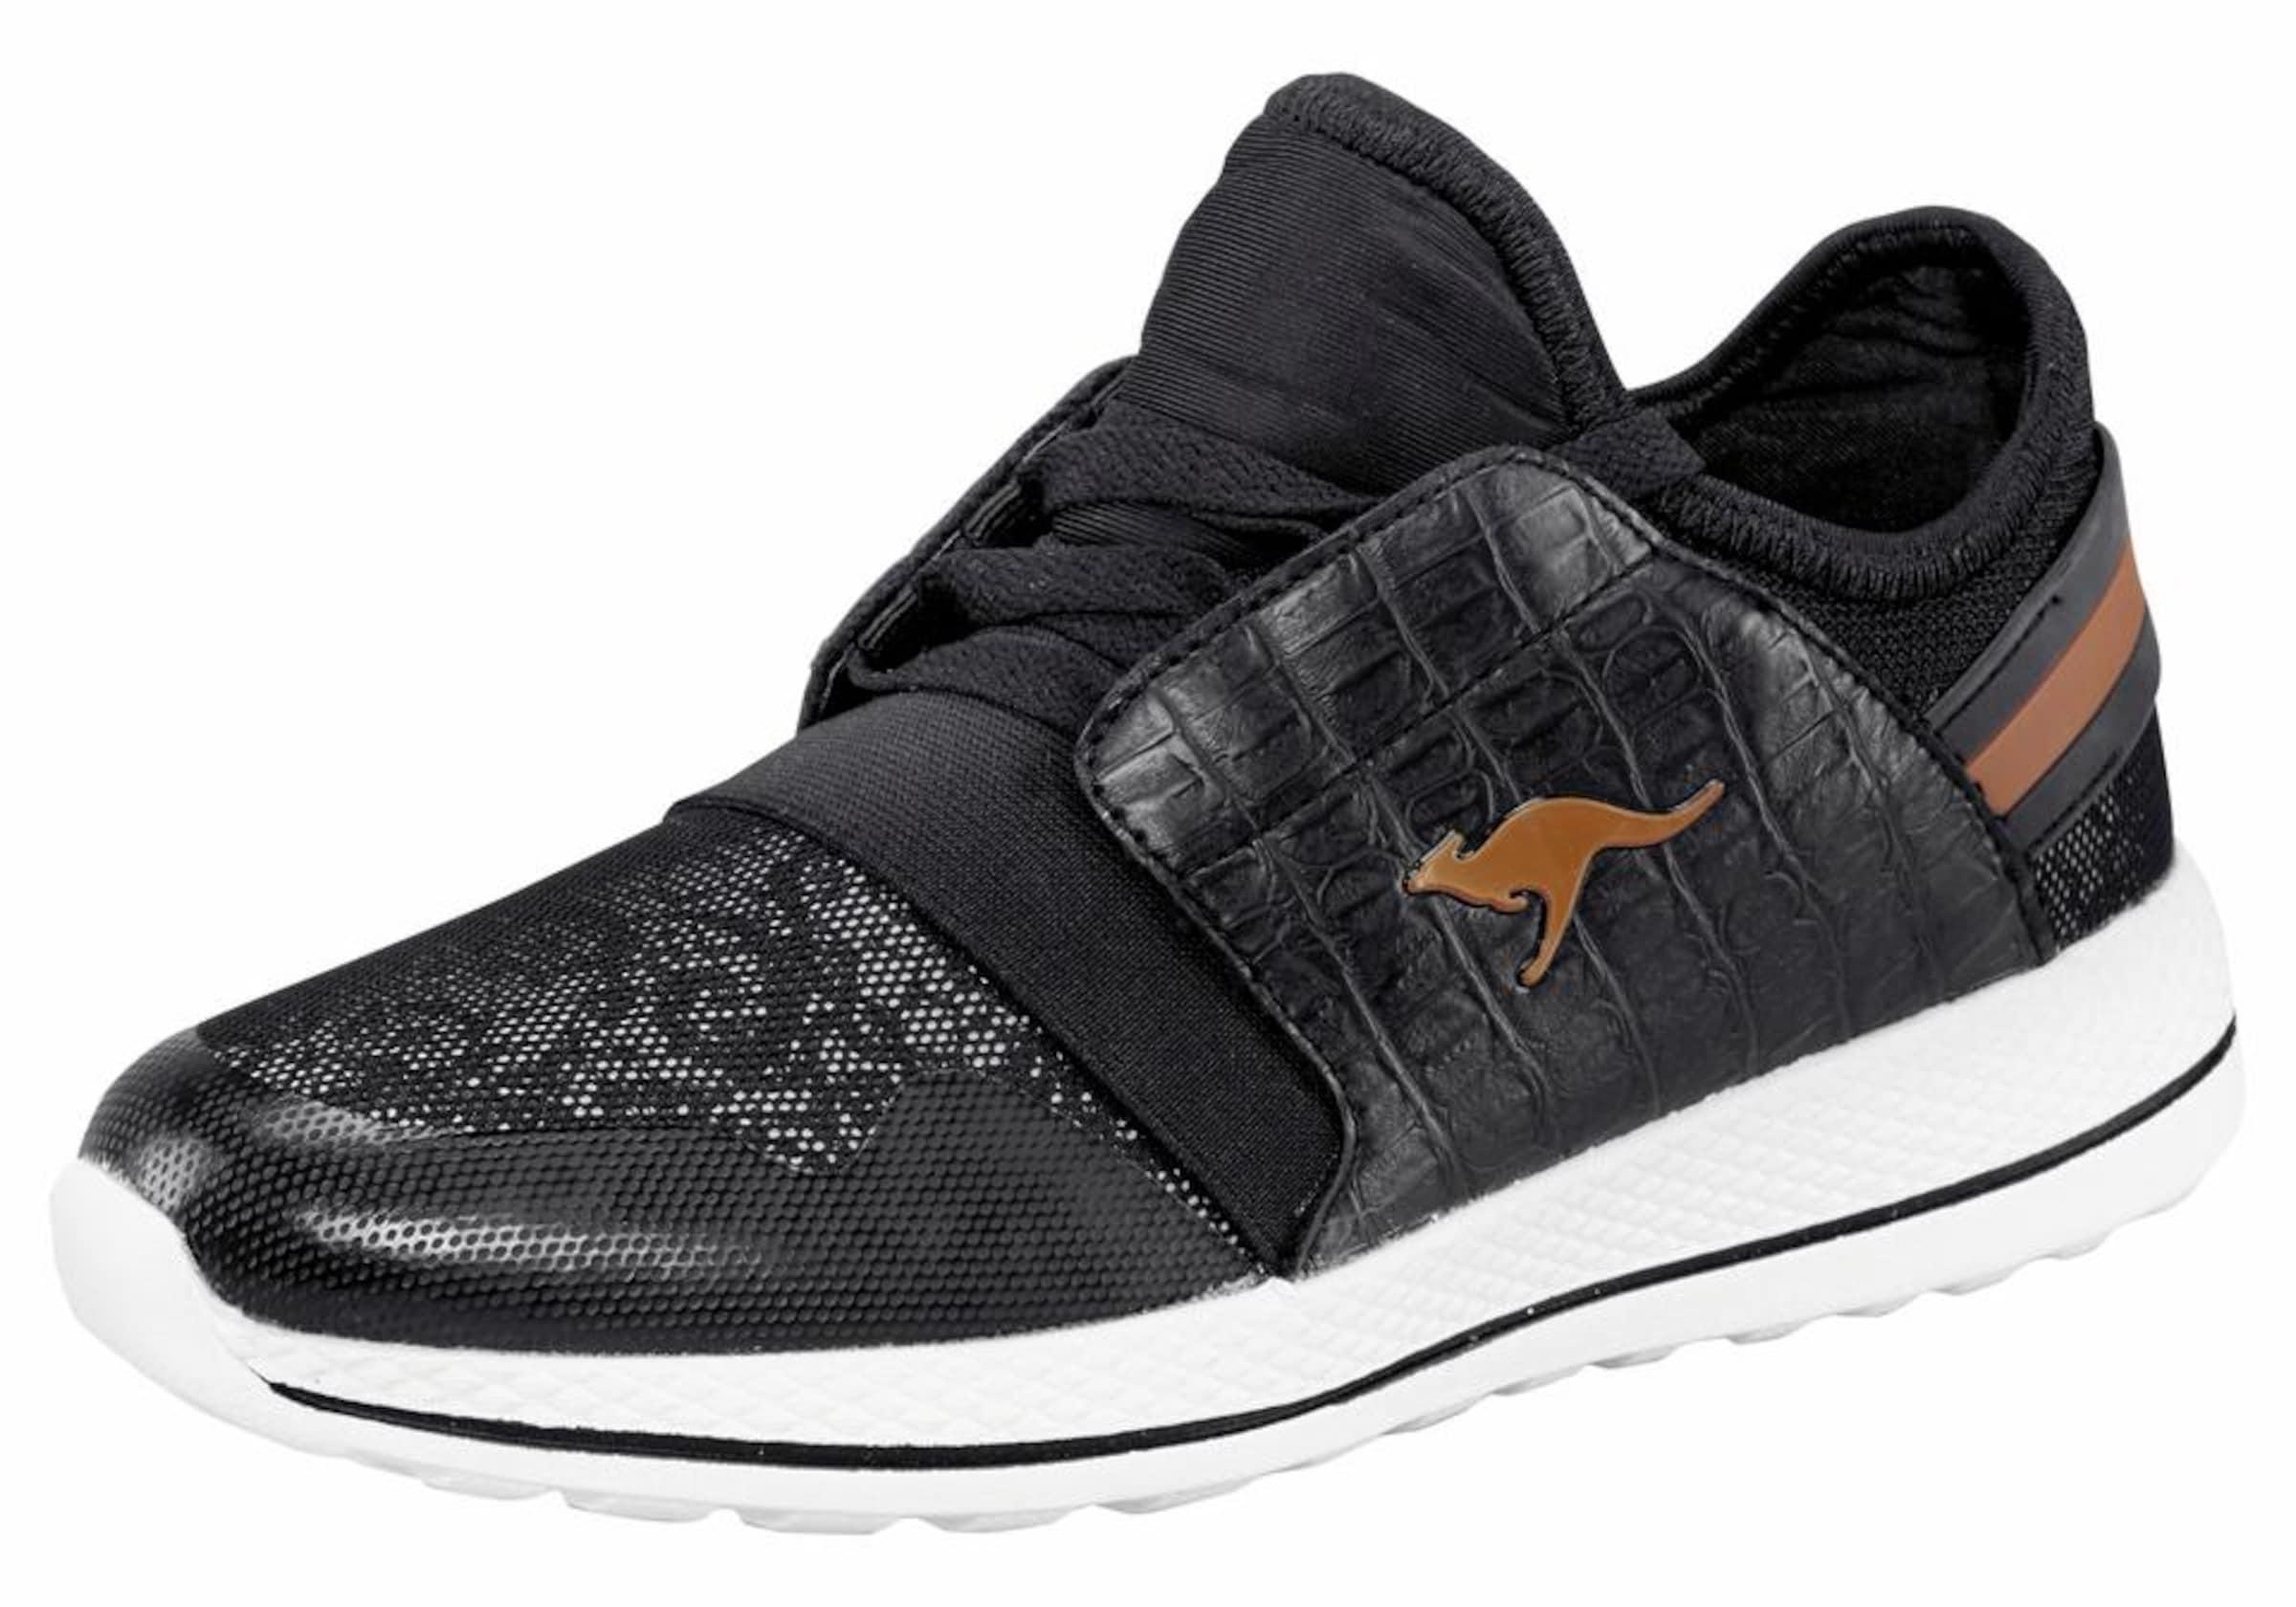 KangaROOS Sneaker W-300 Verschleißfeste billige Schuhe